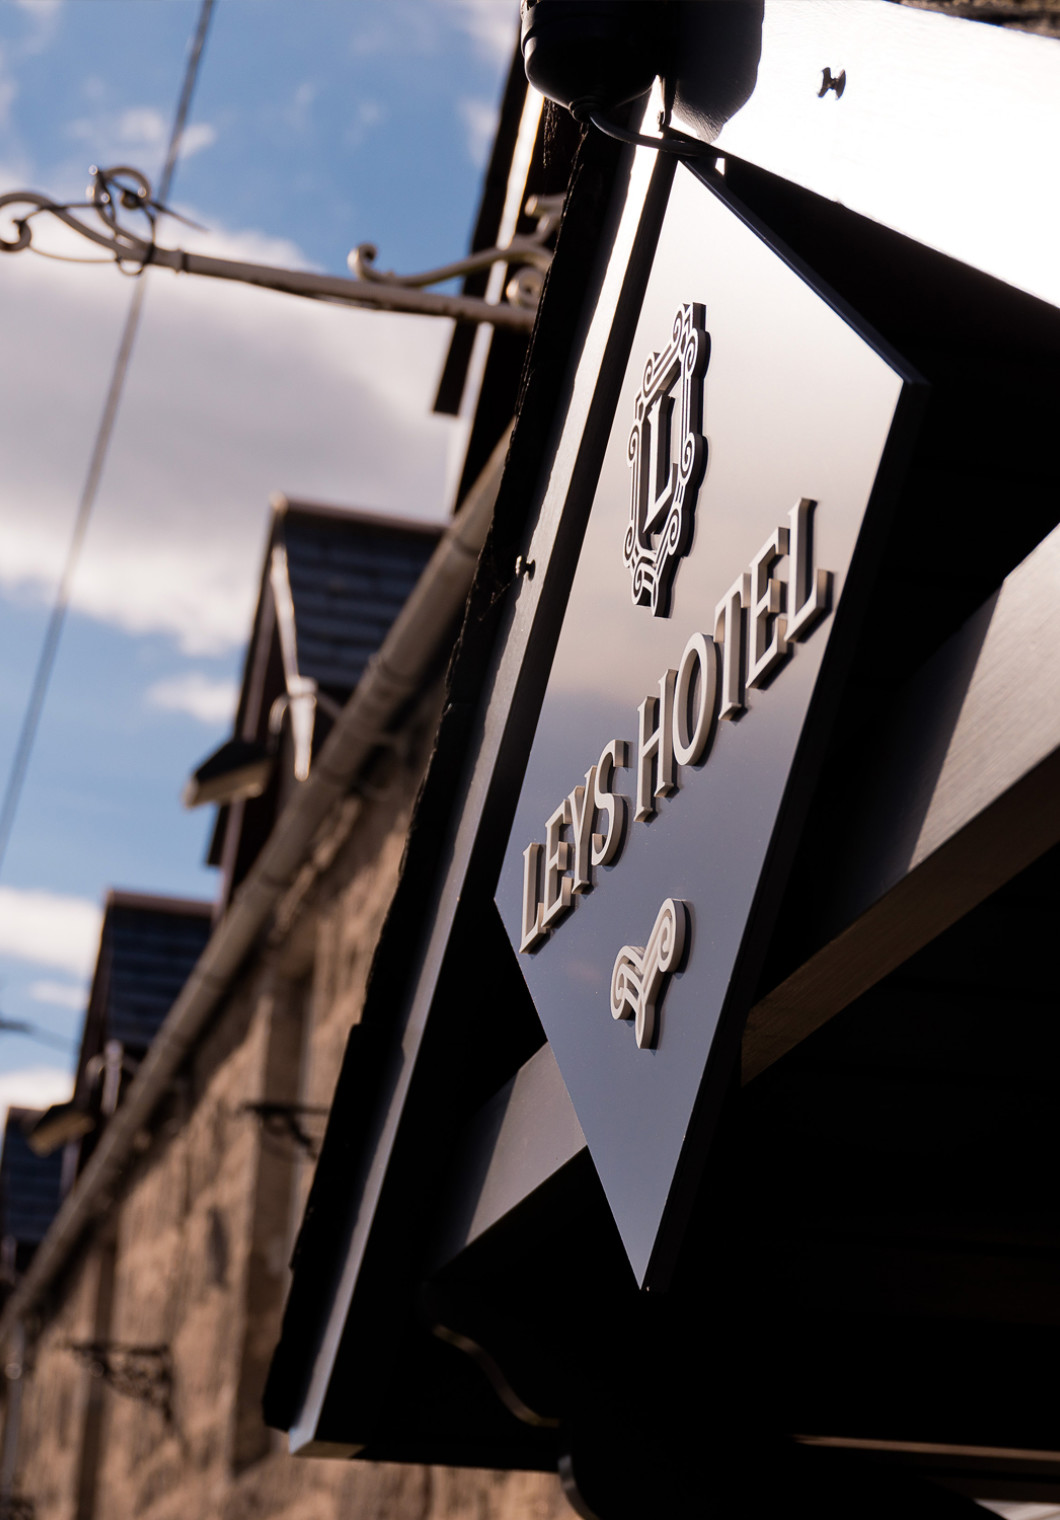 The Leys Hotel